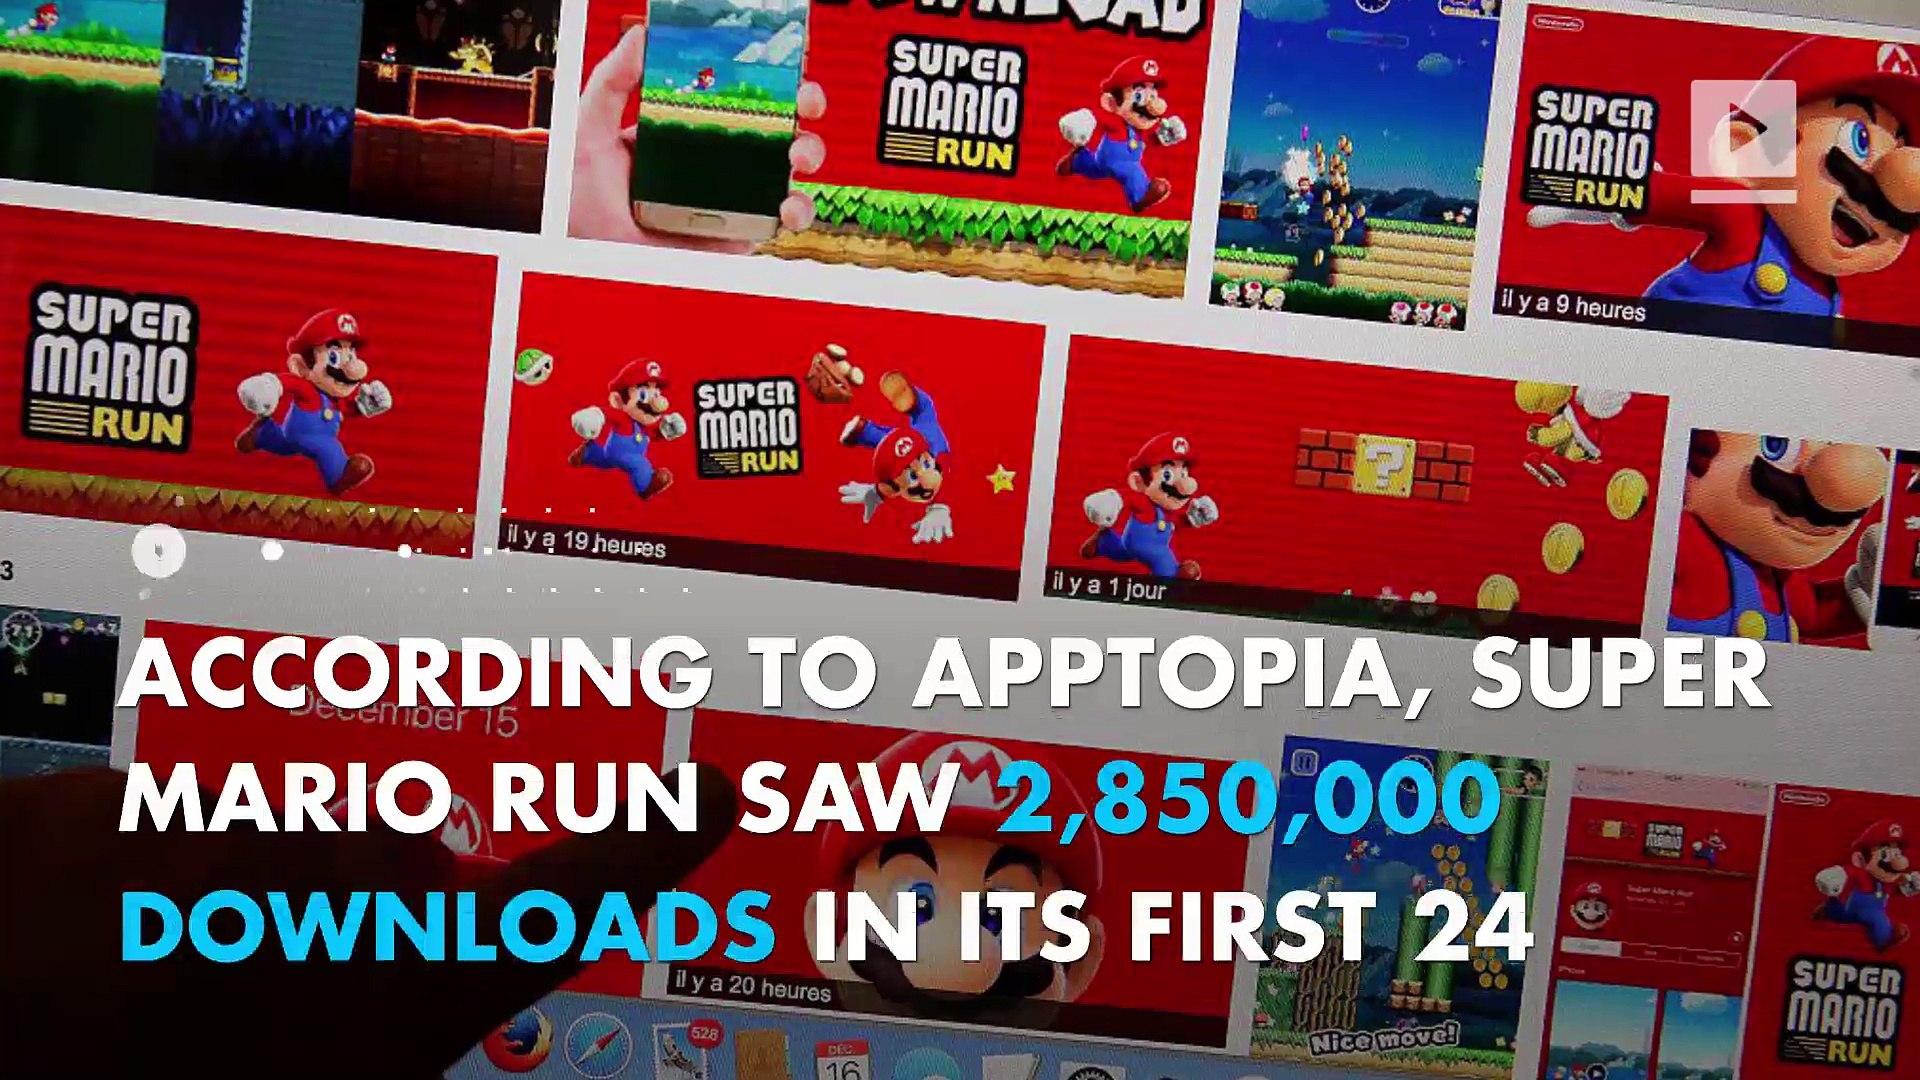 Super Mario Run sees more day one downloads than Pokémon Go